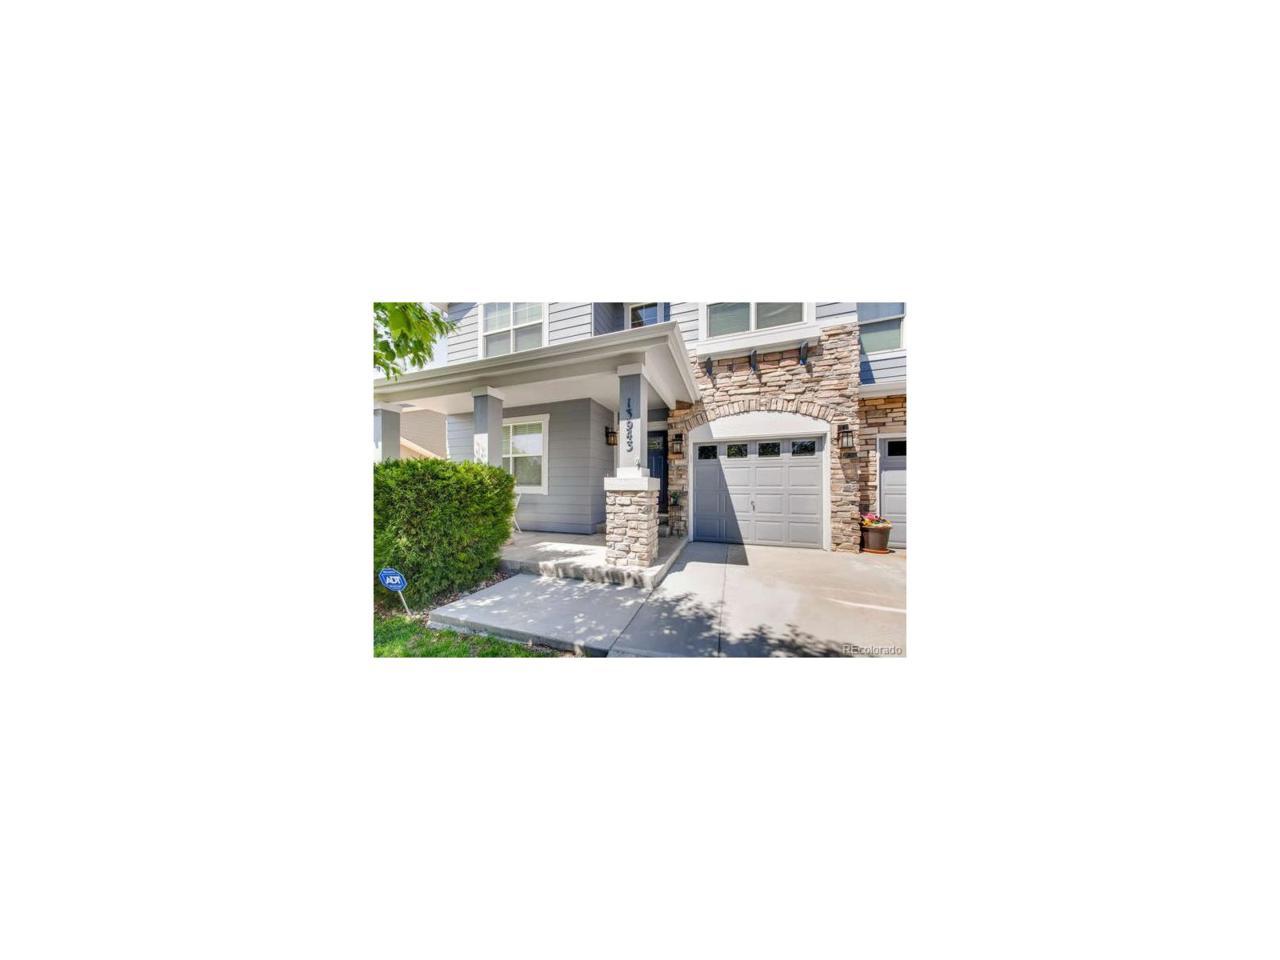 13943 Star Creek Drive, Broomfield, CO 80023 (MLS #6057656) :: 8z Real Estate